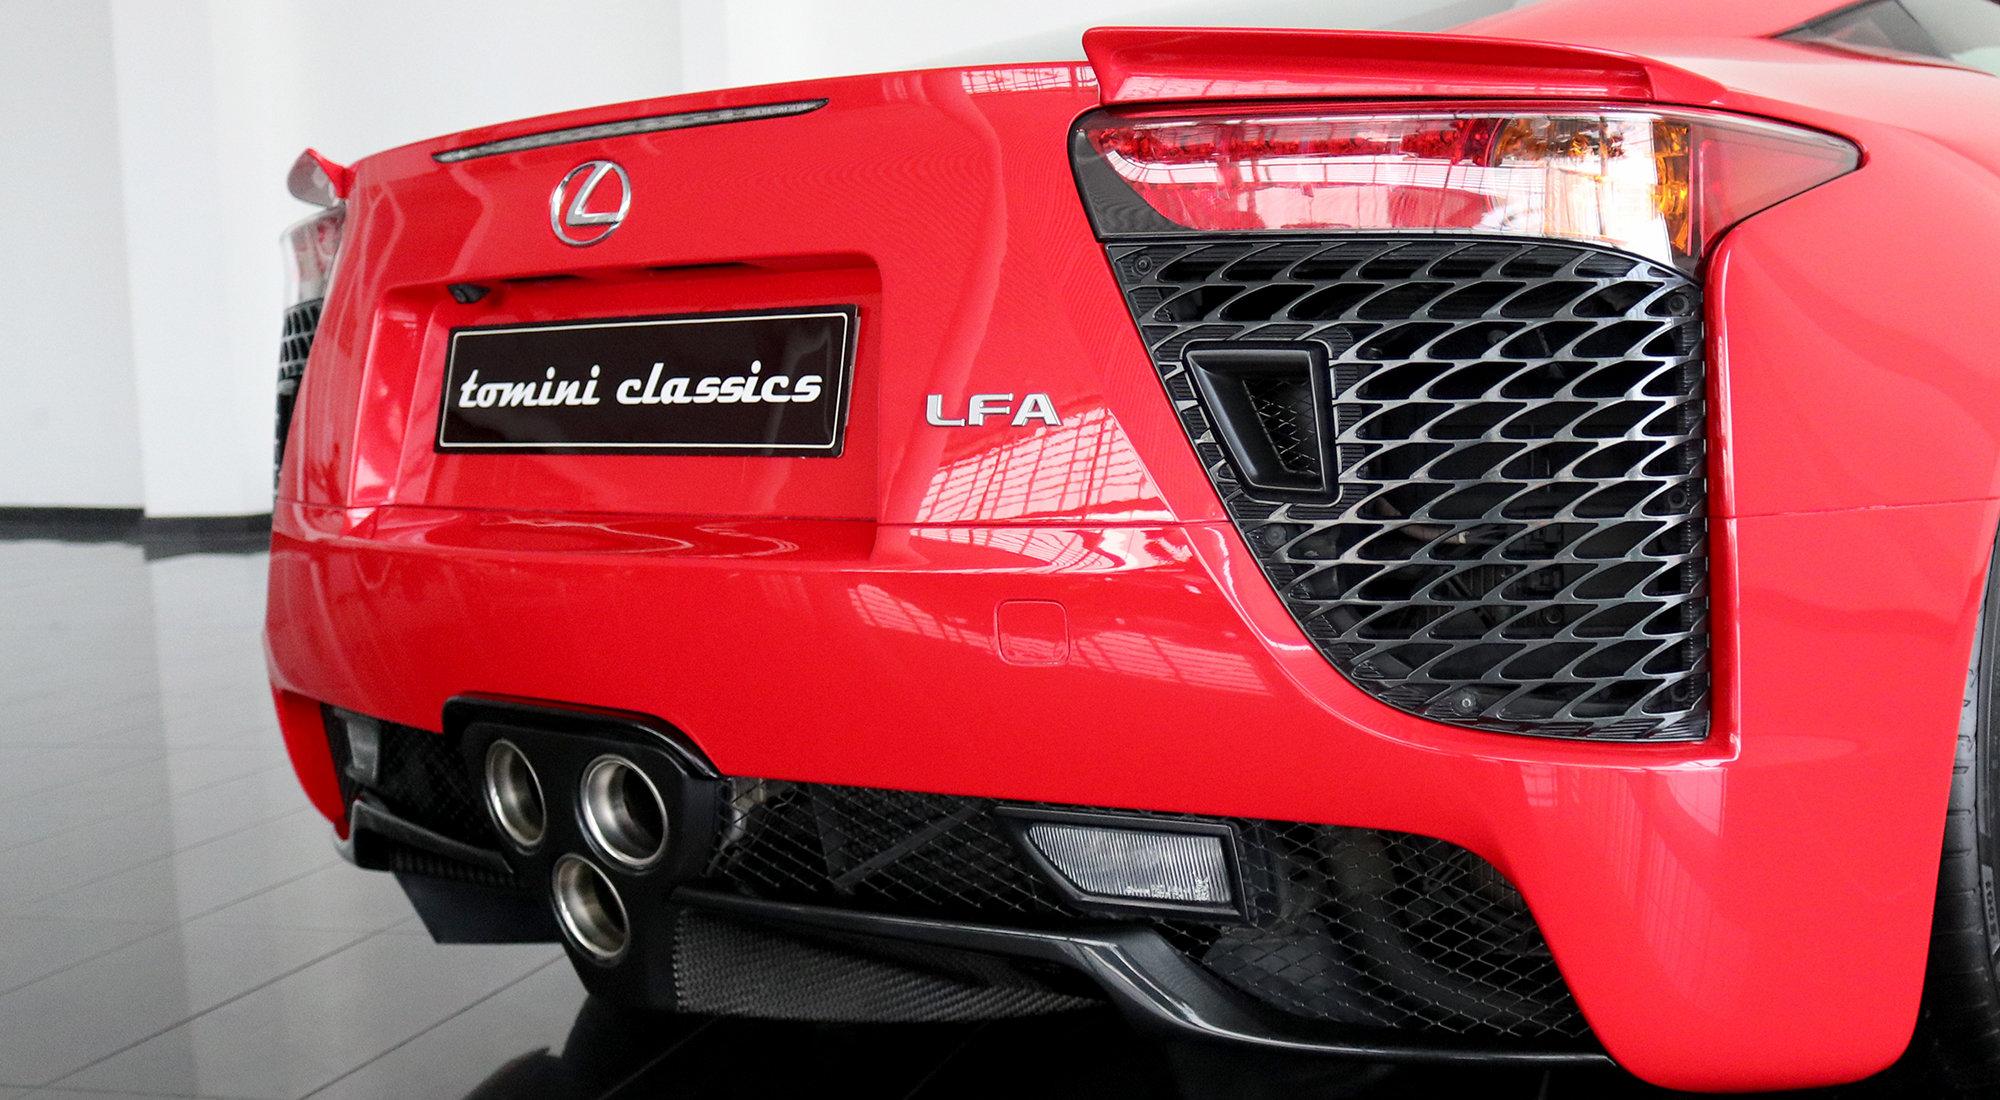 Lexus LFA (2012) For Sale (picture 6 of 6)